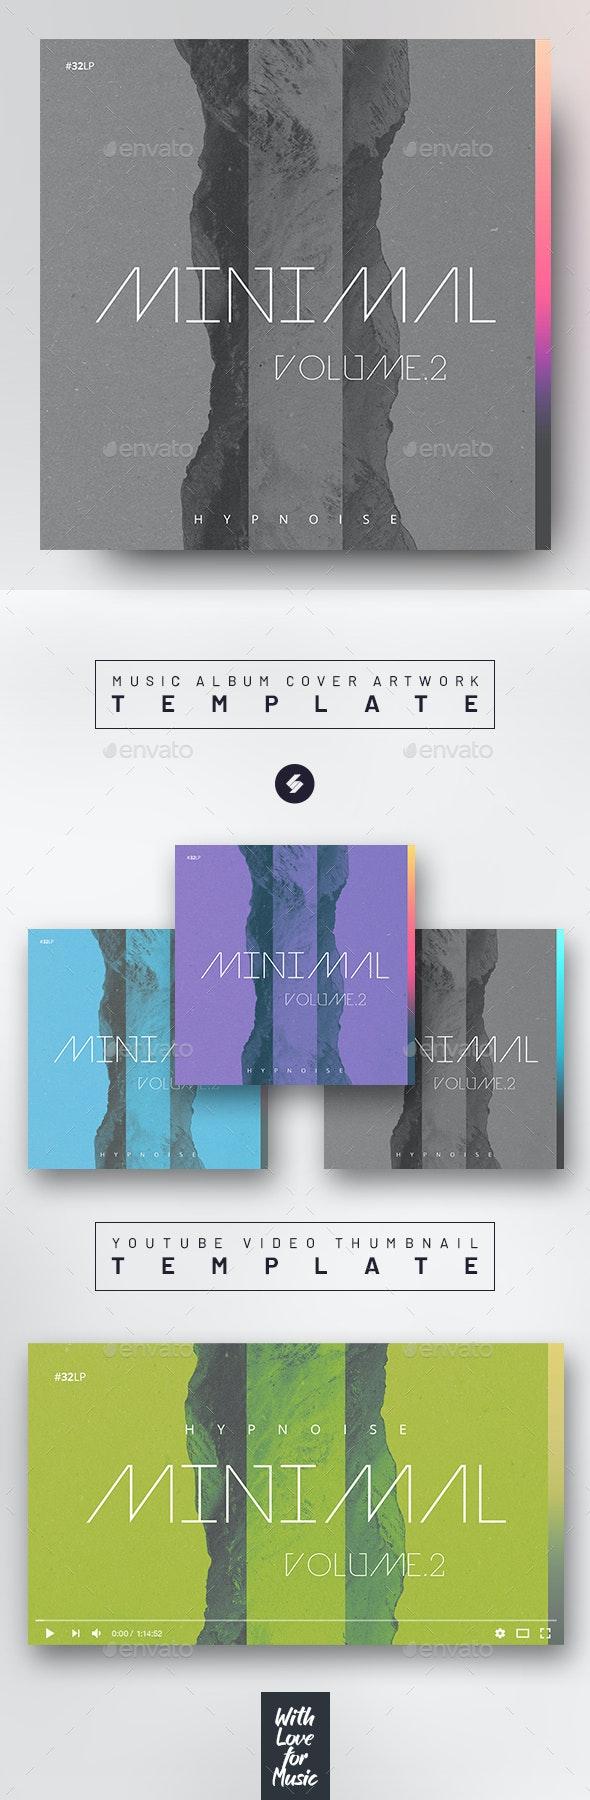 Minimal 2 – Music Album Cover Artwork / Video Thumbnail Template - Miscellaneous Social Media